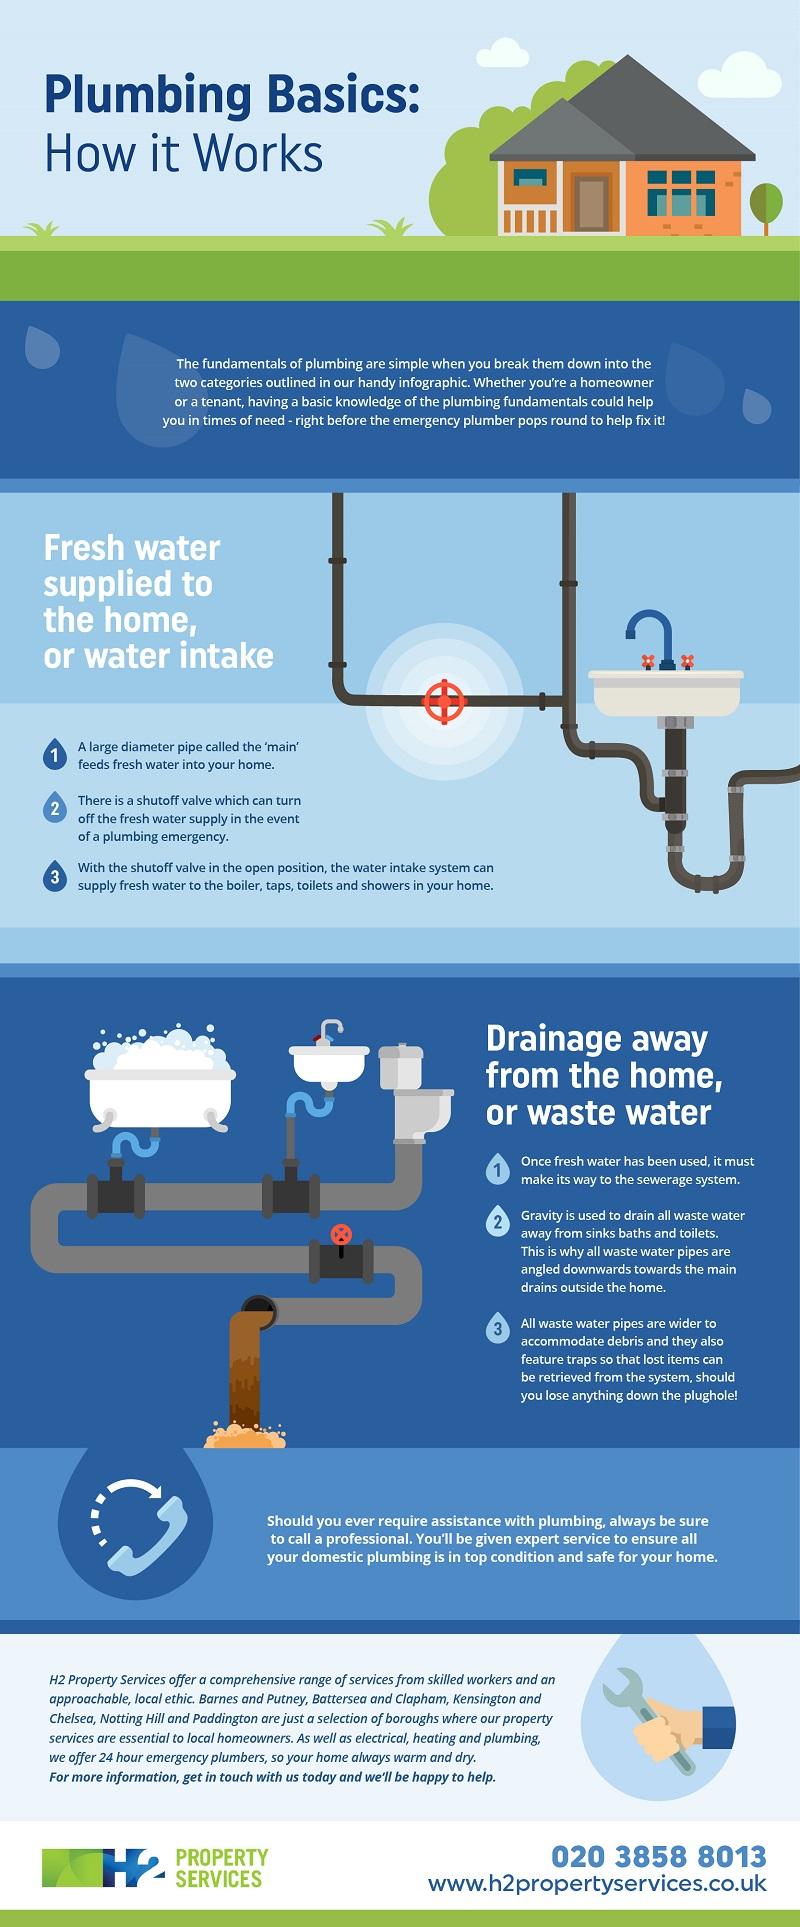 Plumbing Basics: How It Works